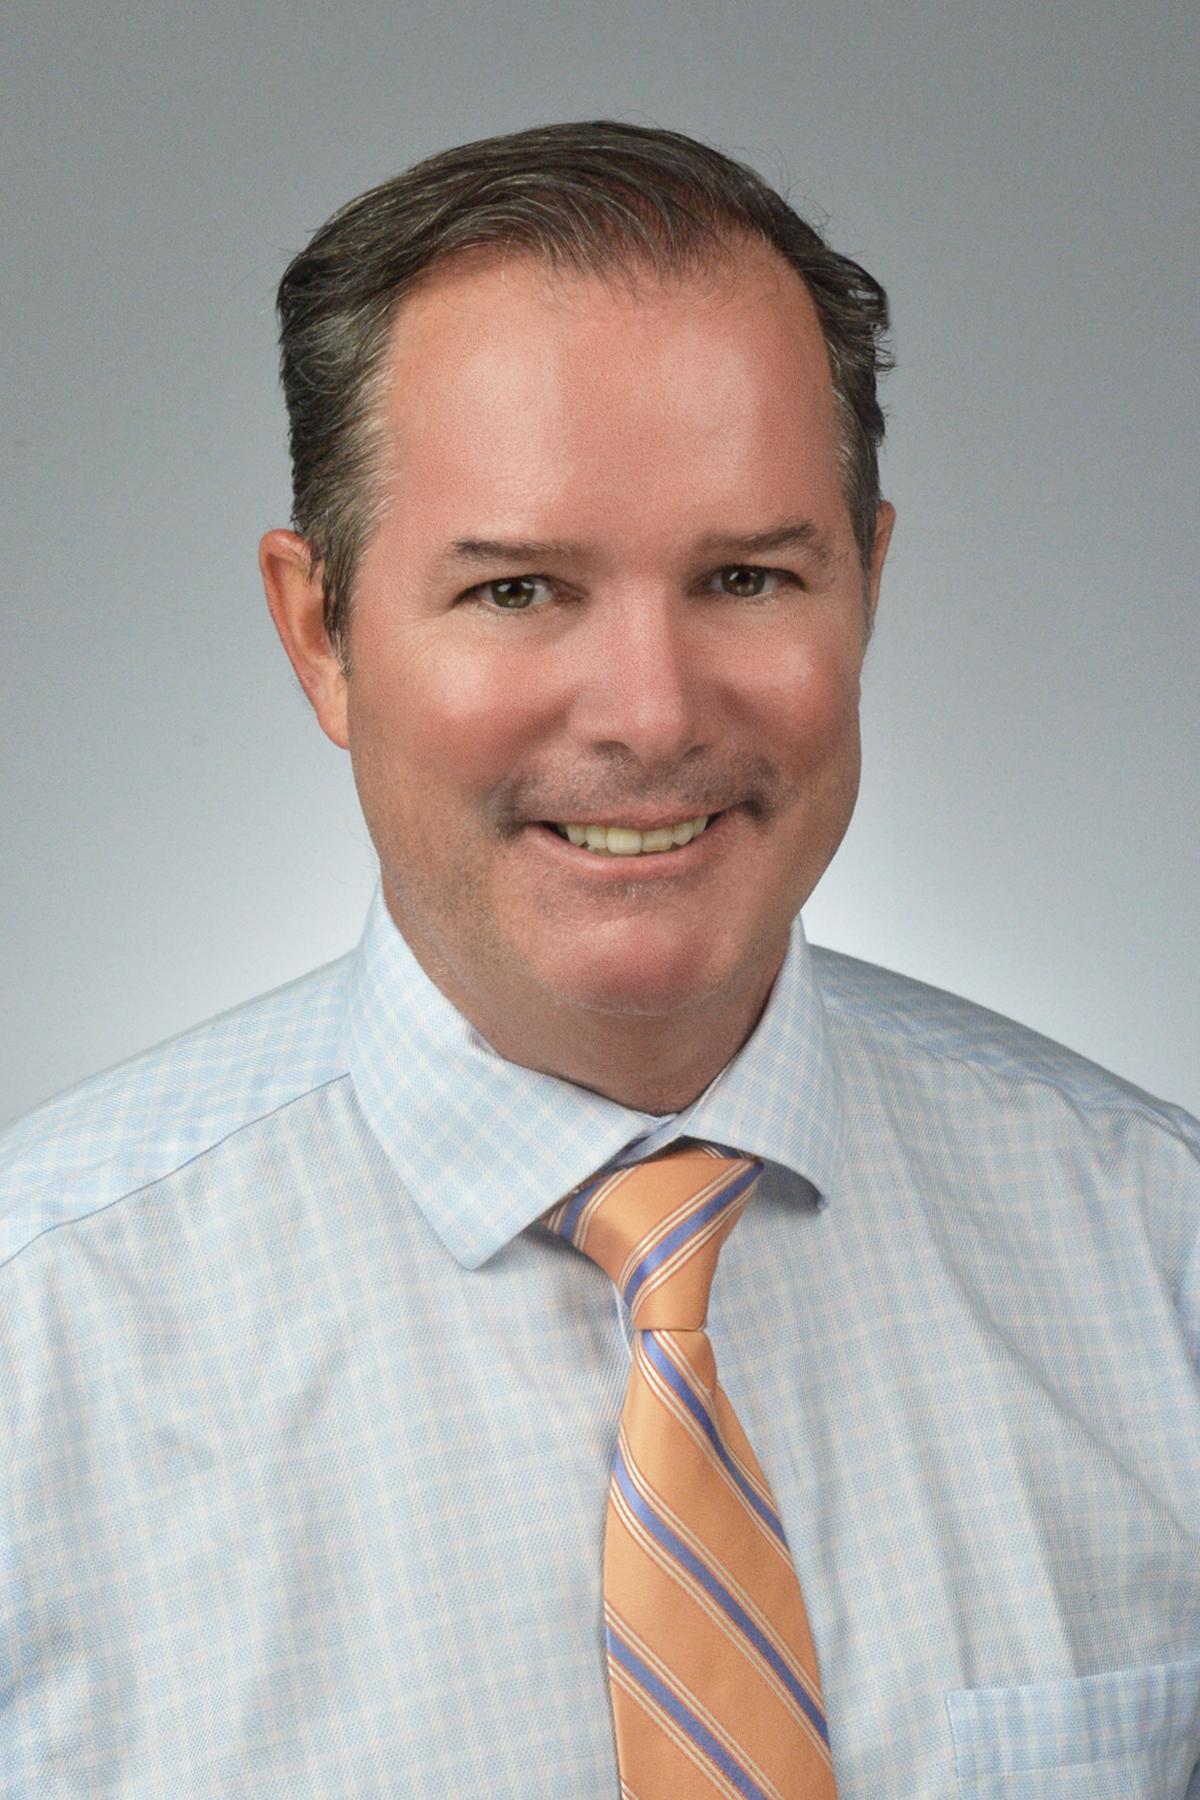 Steven Schramm, Atlanta Physician